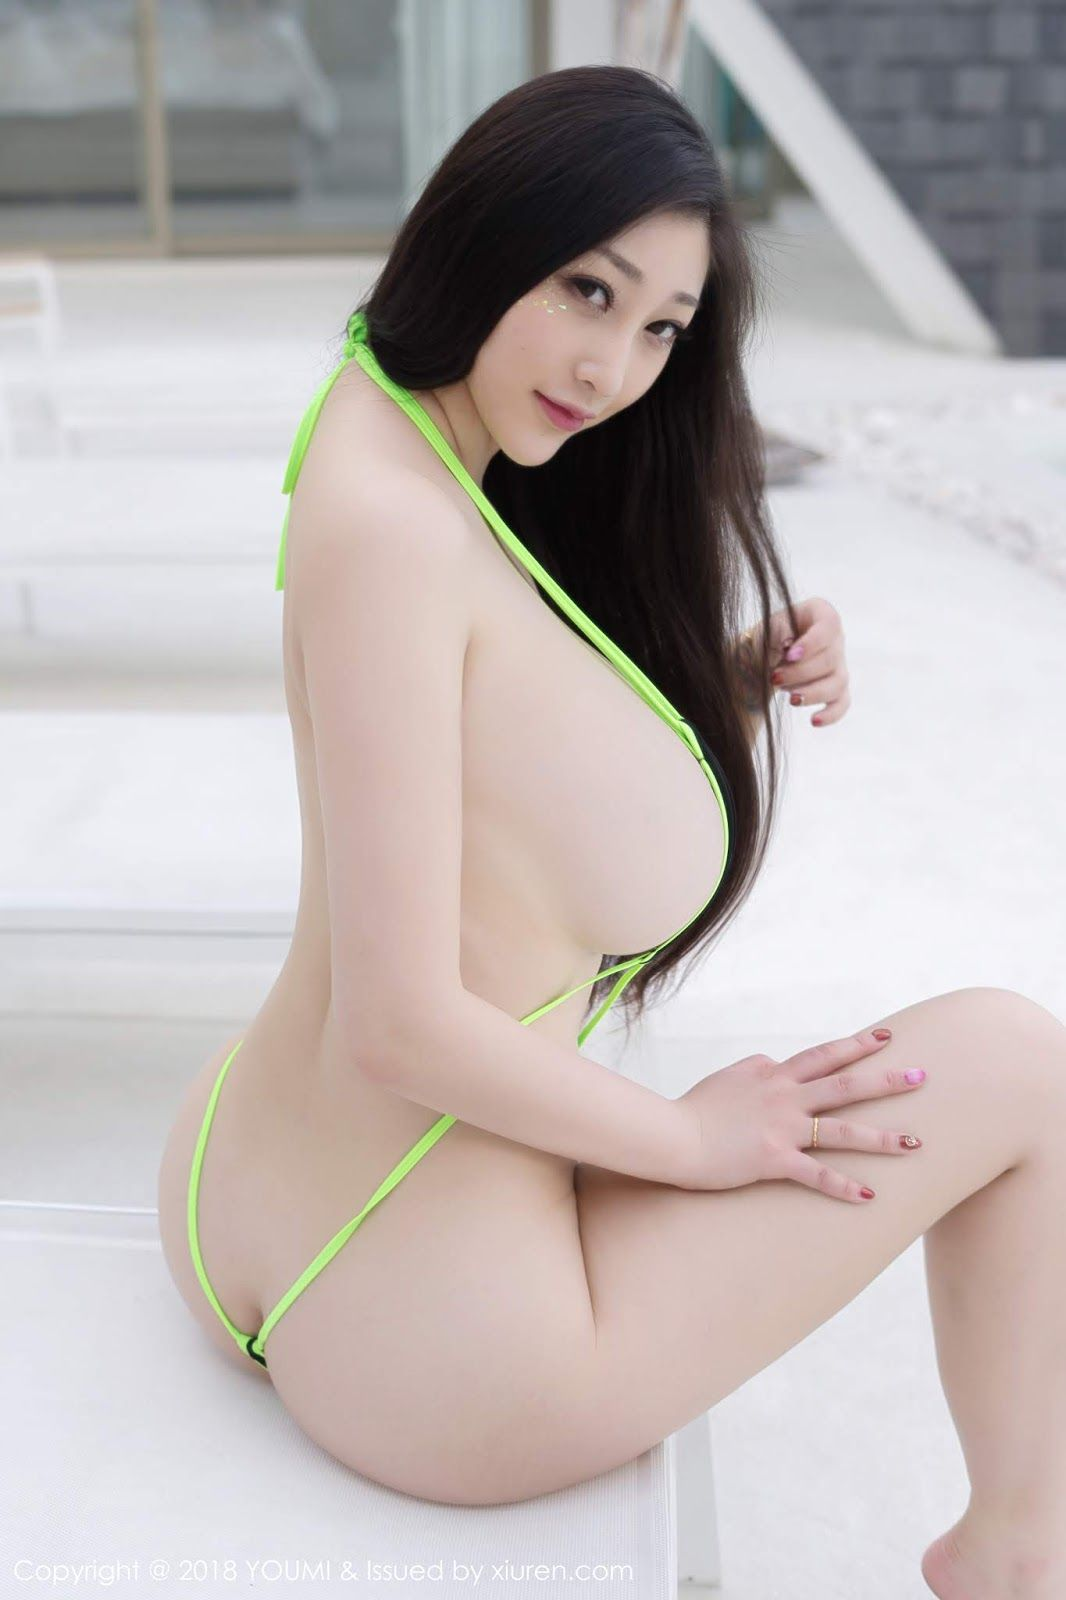 Asian hot photo